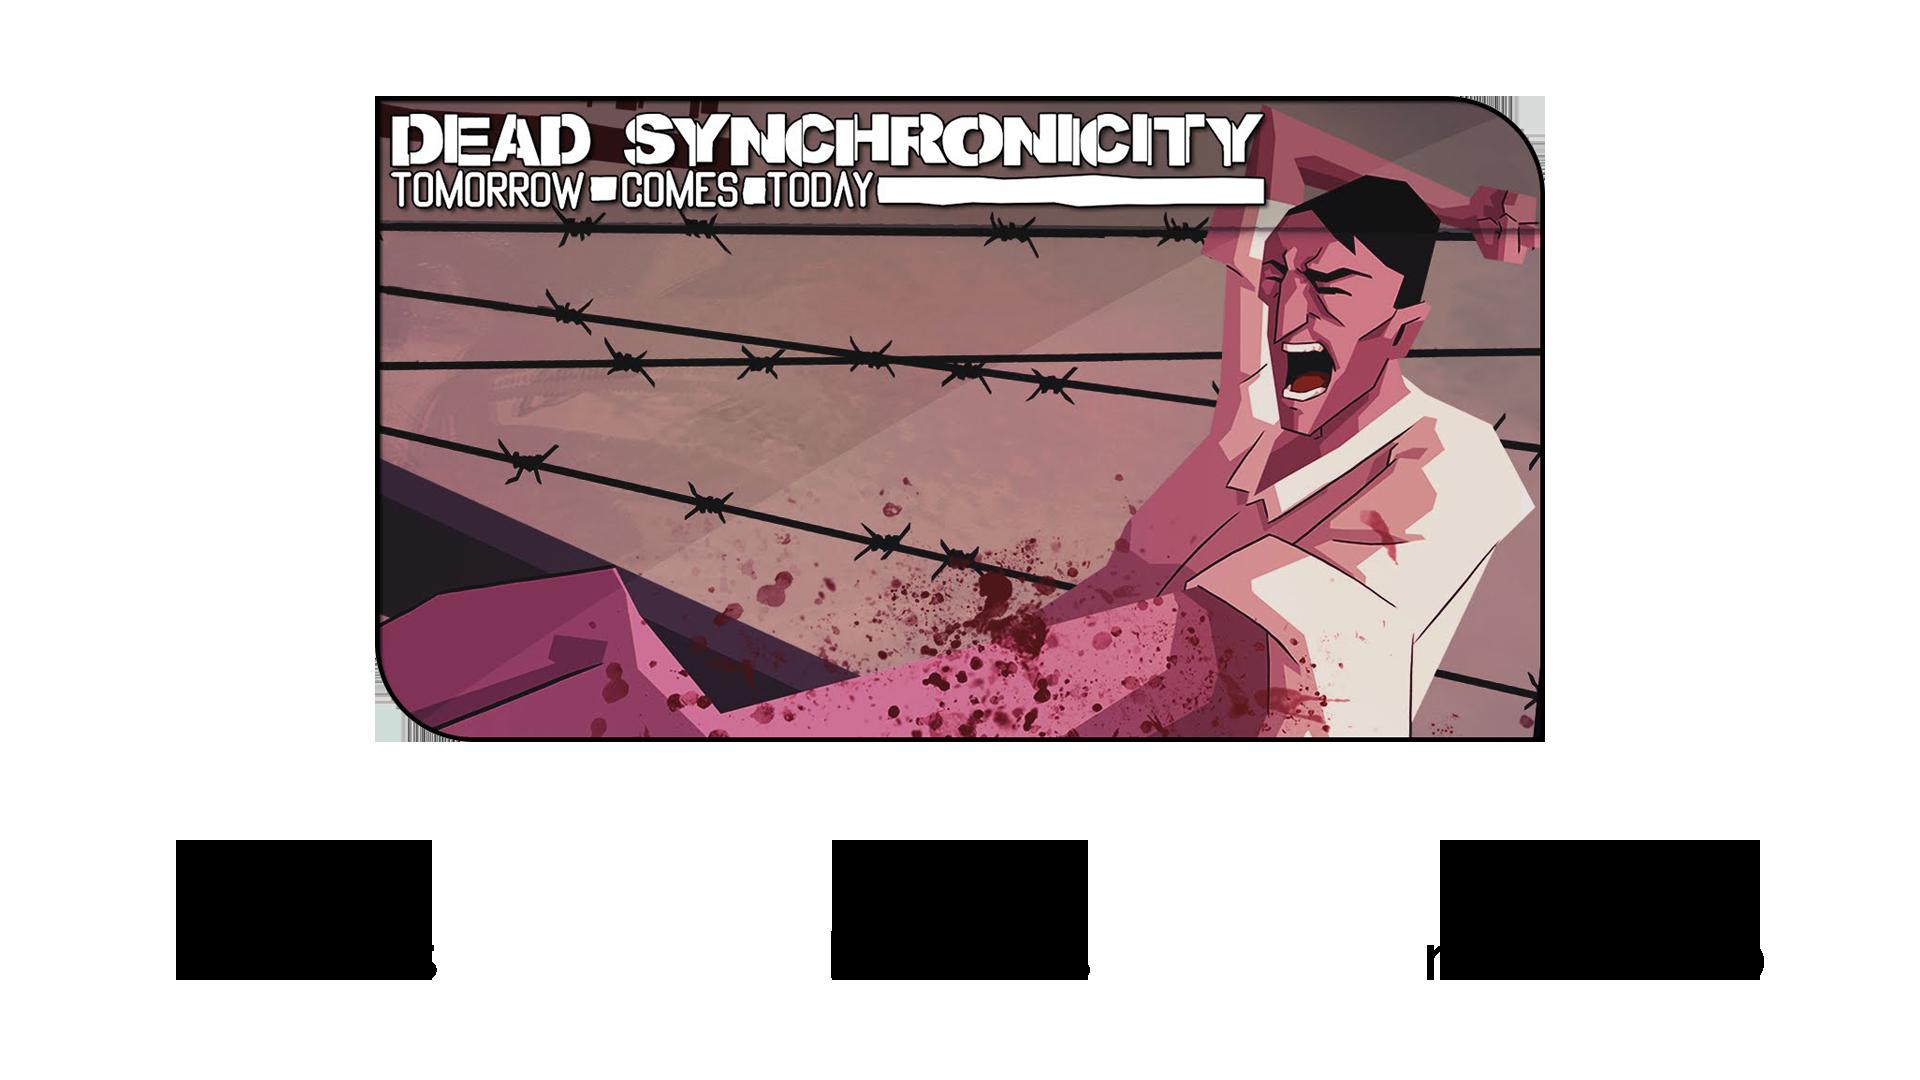 dead synchronicity fictiorama studios proyecto kickstarter espana steam SYBIC crowdfunding